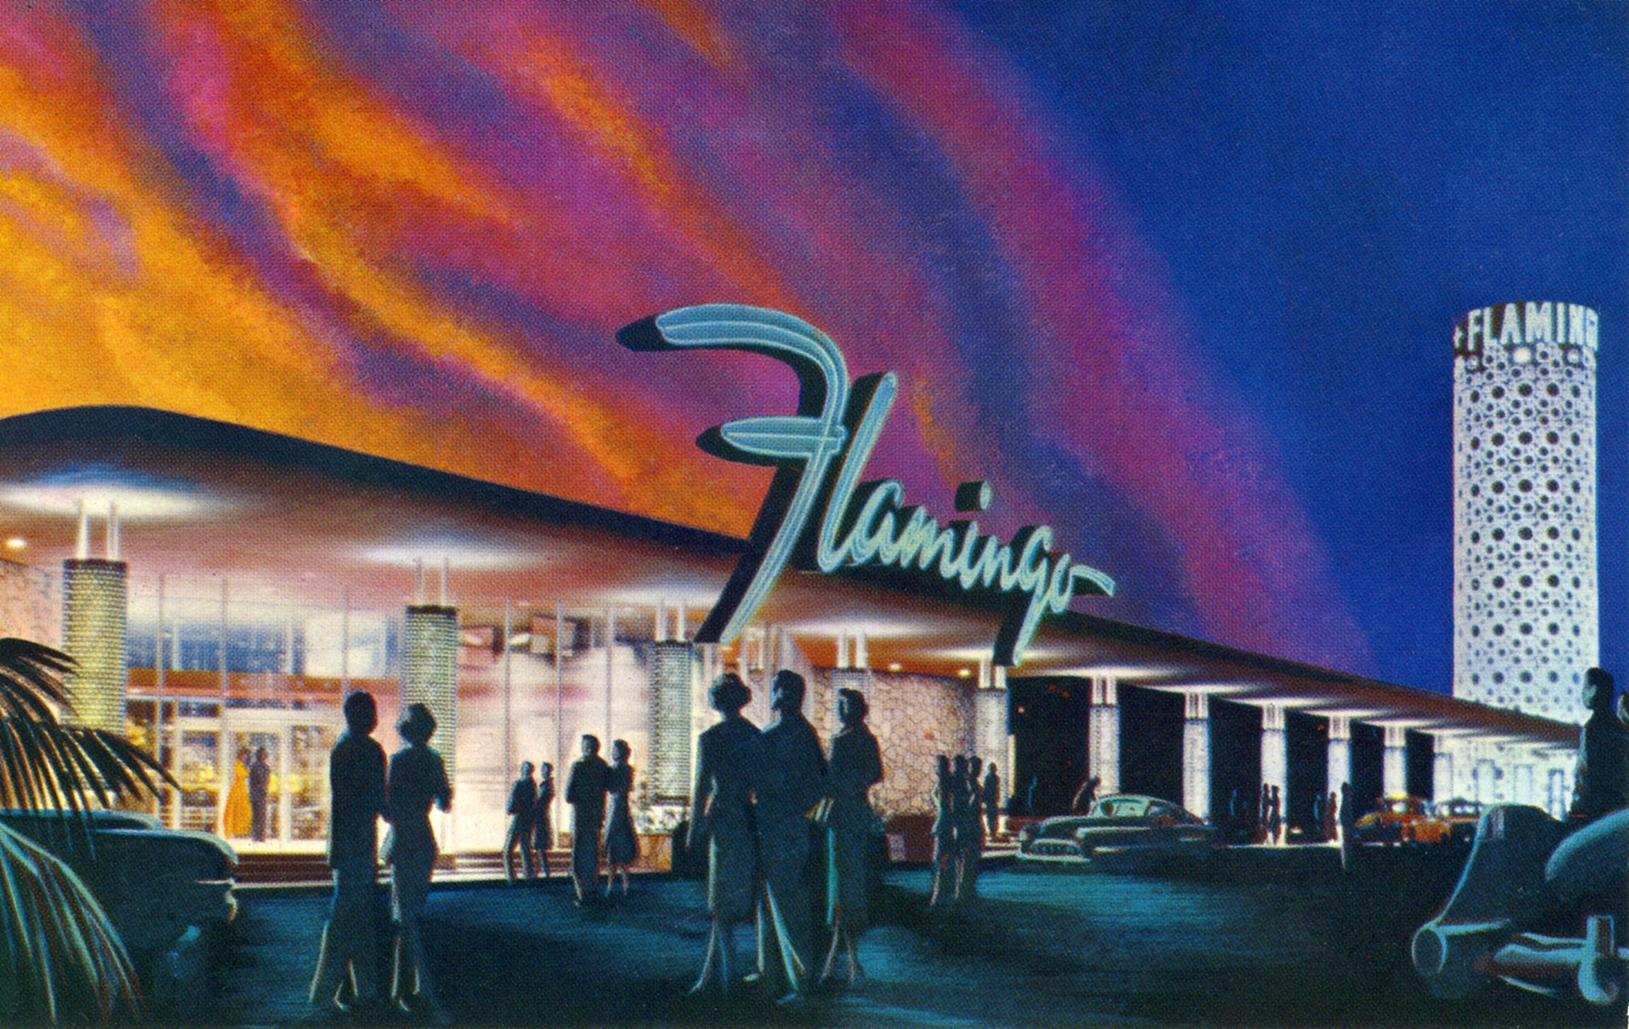 Flamingo Hotel and Casino - 3555 Las Vegas Boulevard South, Las Vegas, Nevada U.S.A. - 1958